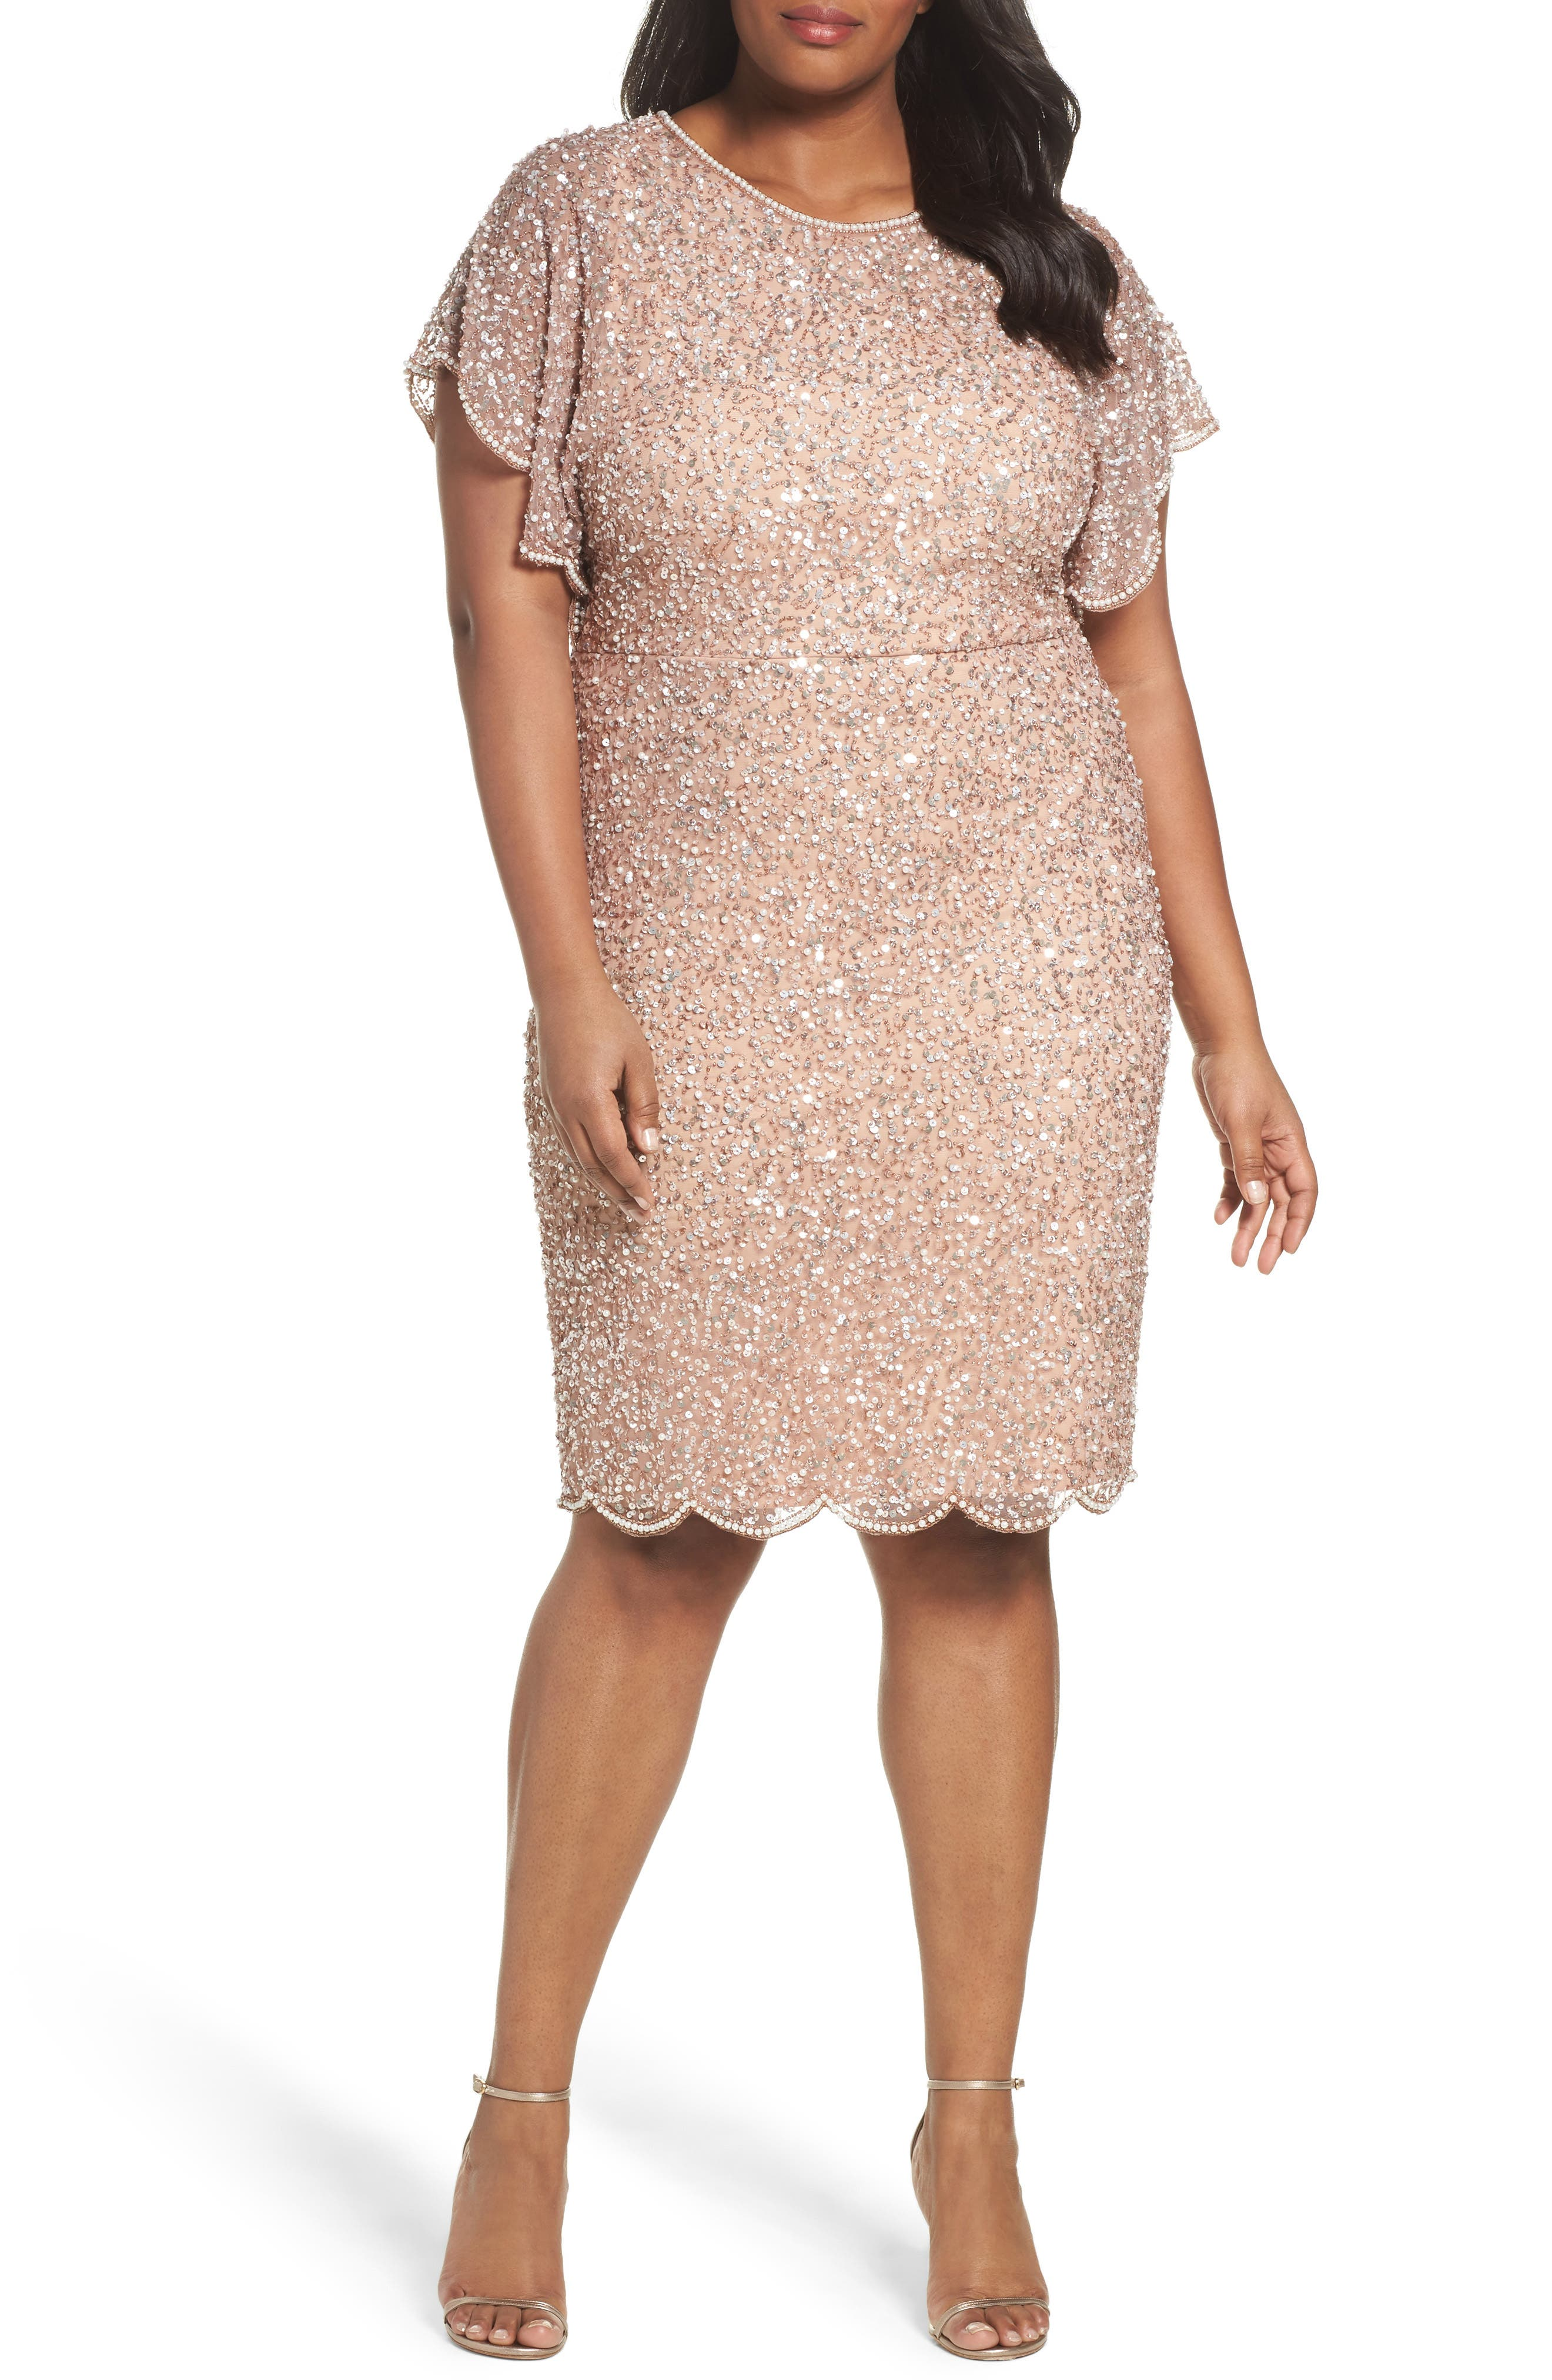 Alternate Image 1 Selected - Adrianna Papell Beaded Flutter Sleeve Sheath Dress (Plus Size)